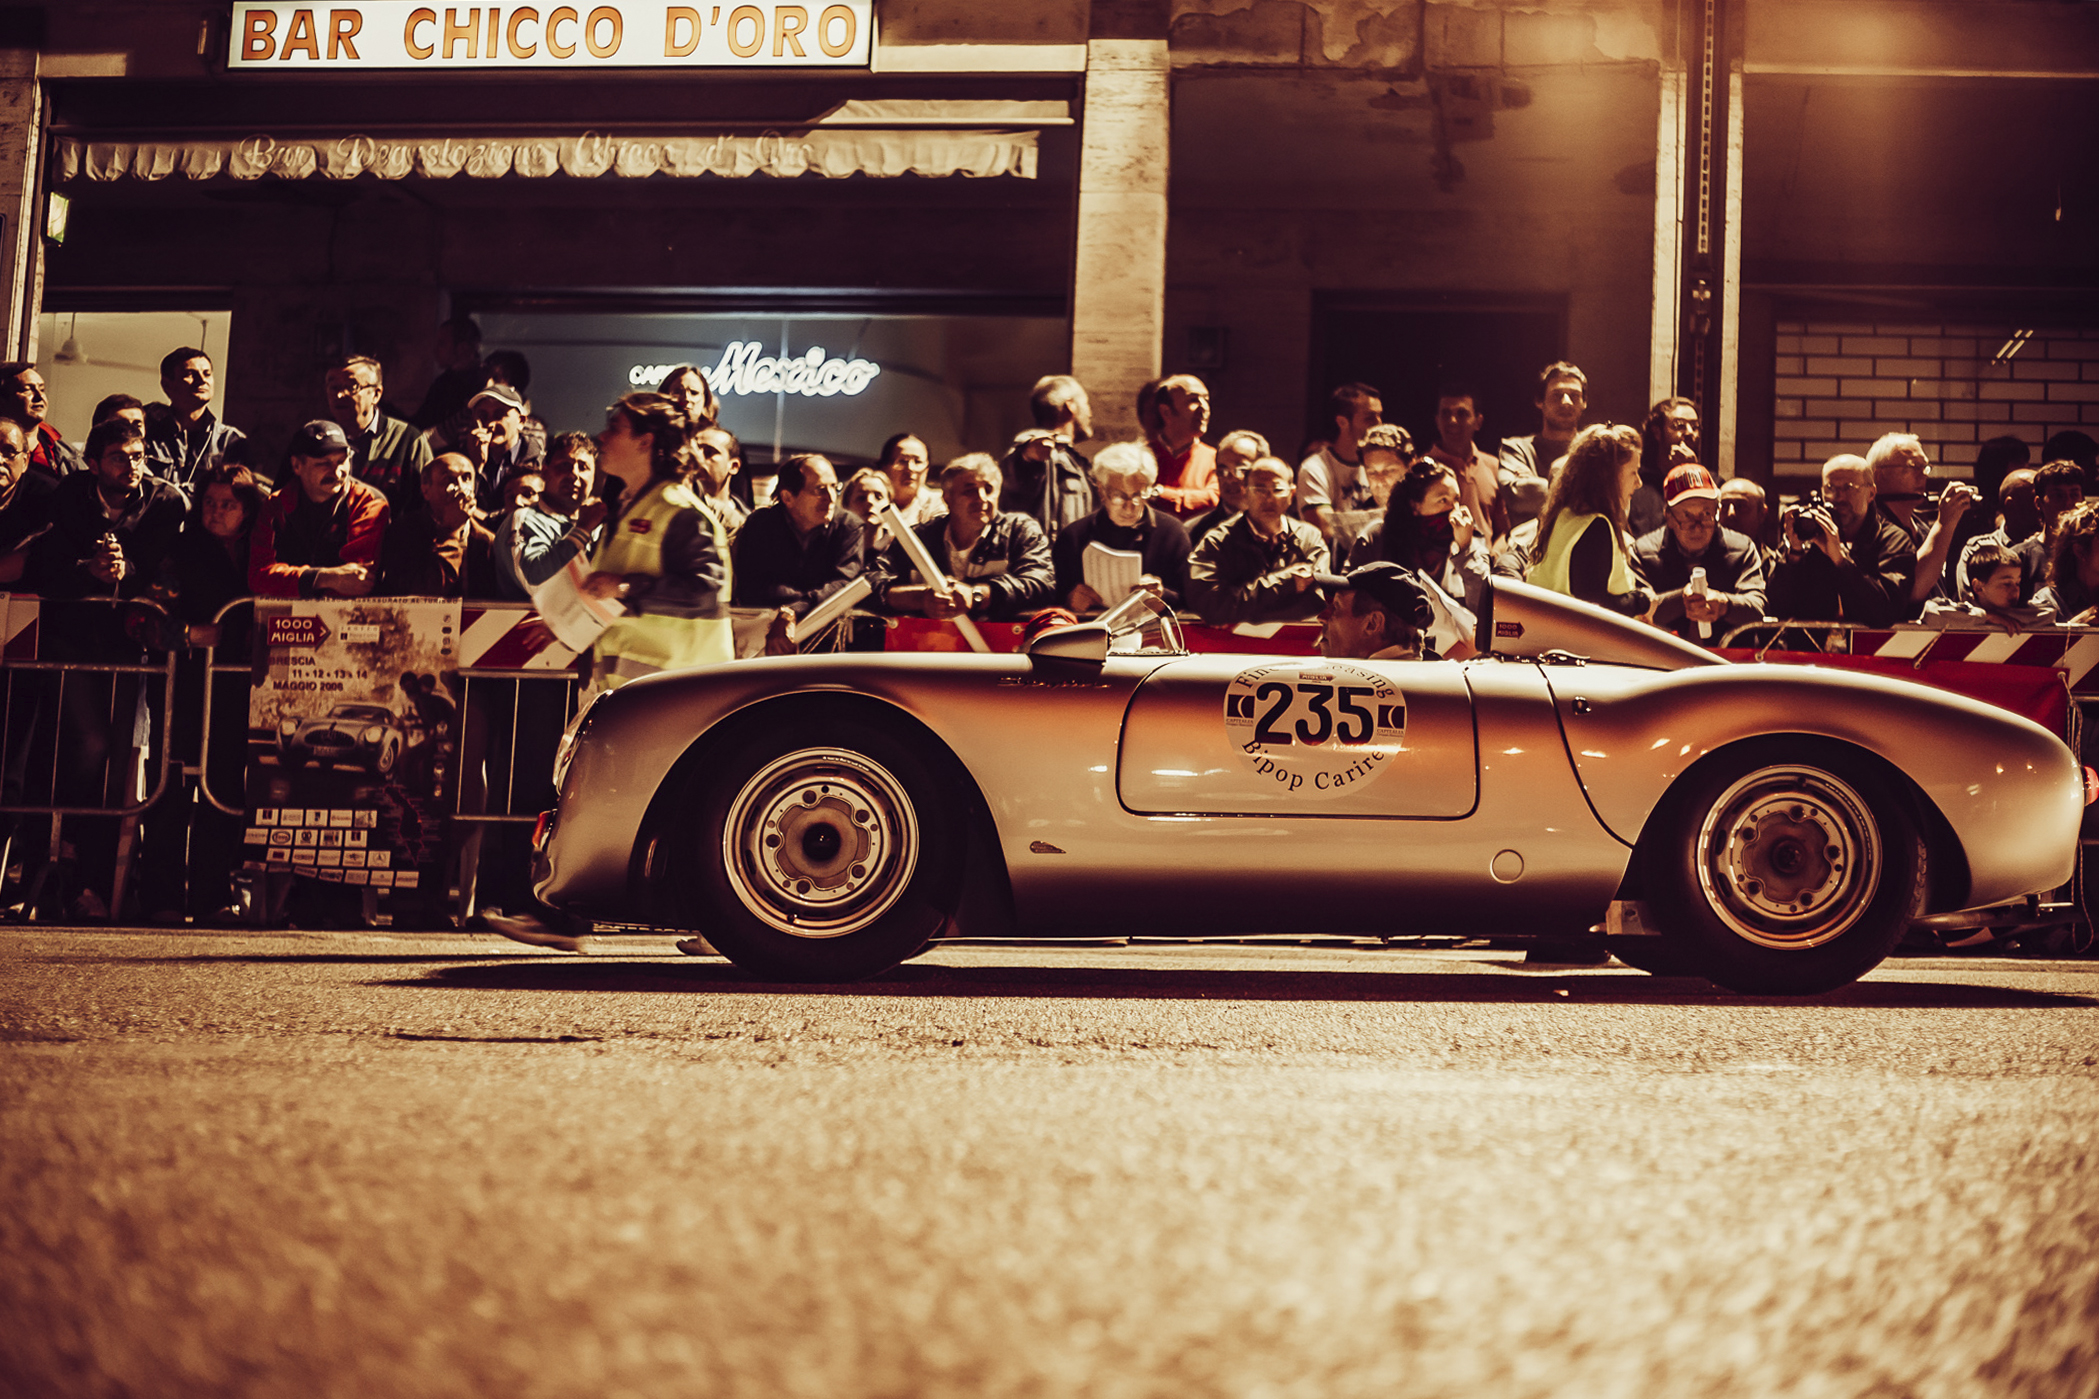 Mille Miglia, Florian Kresse, Autofotografie, csrphotography, Oldtimer, Porsche, Porsche Spyder 550, Vintage car